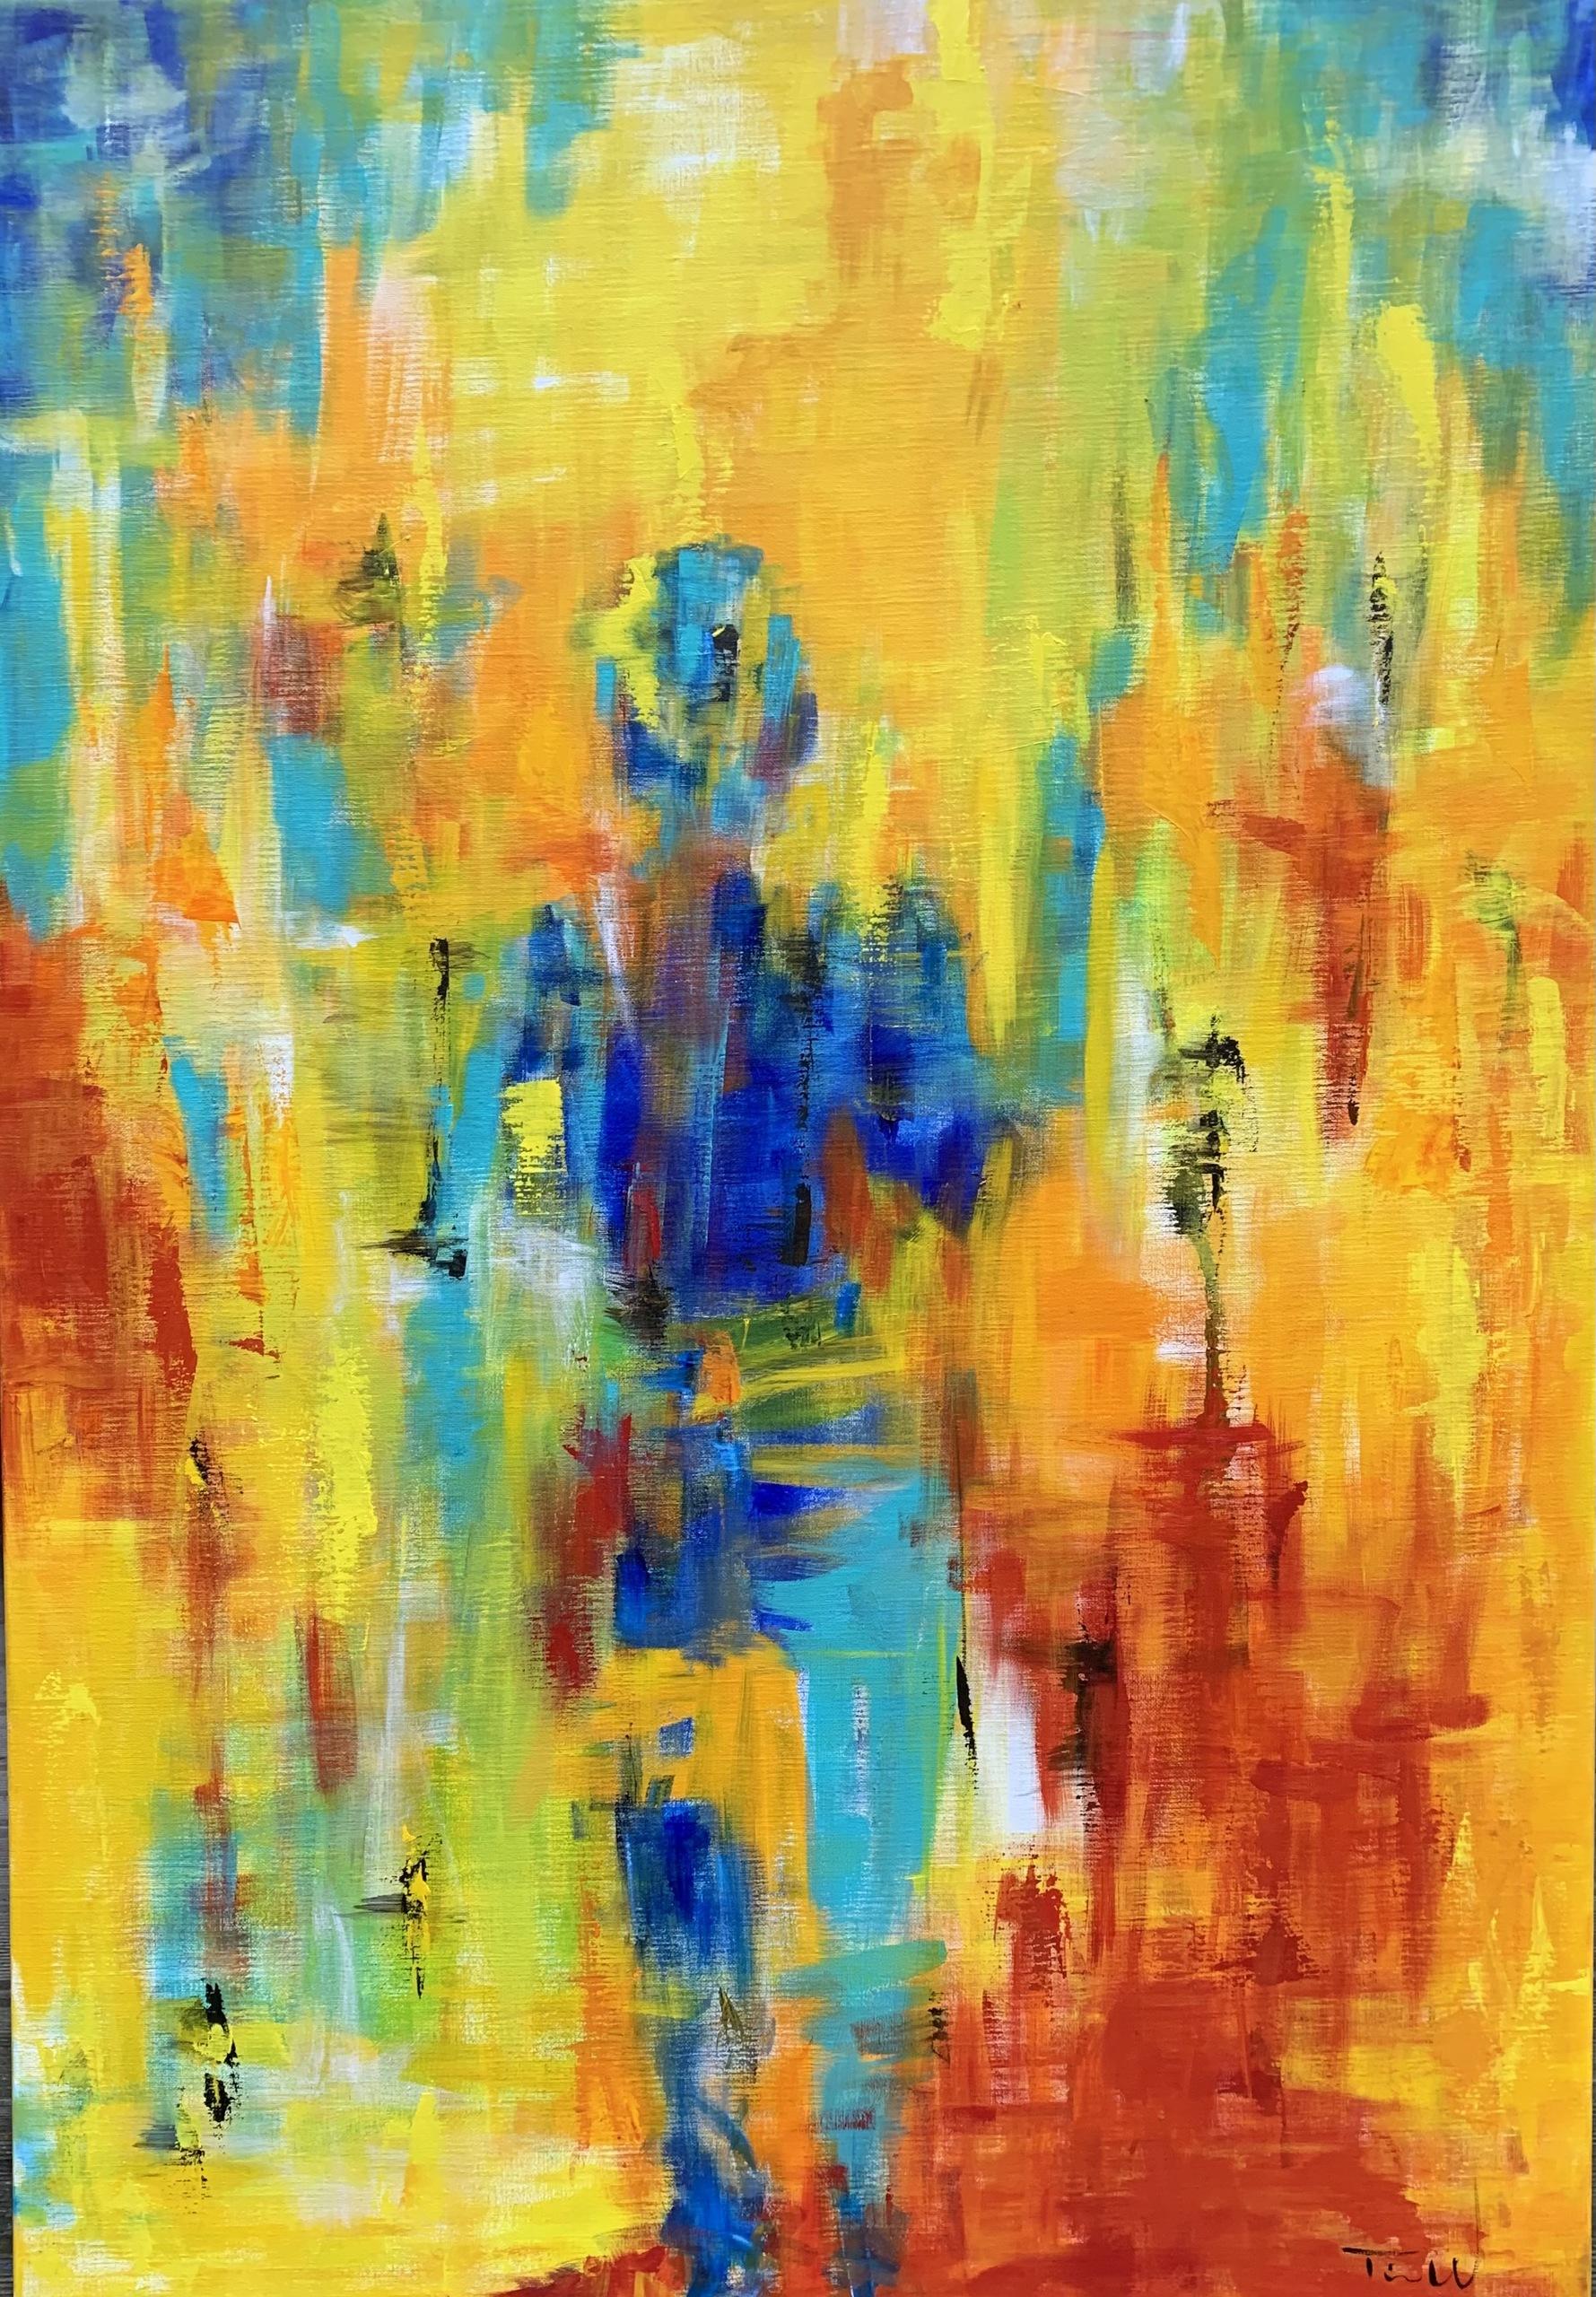 En drømmende komposition med et stort farvespecter